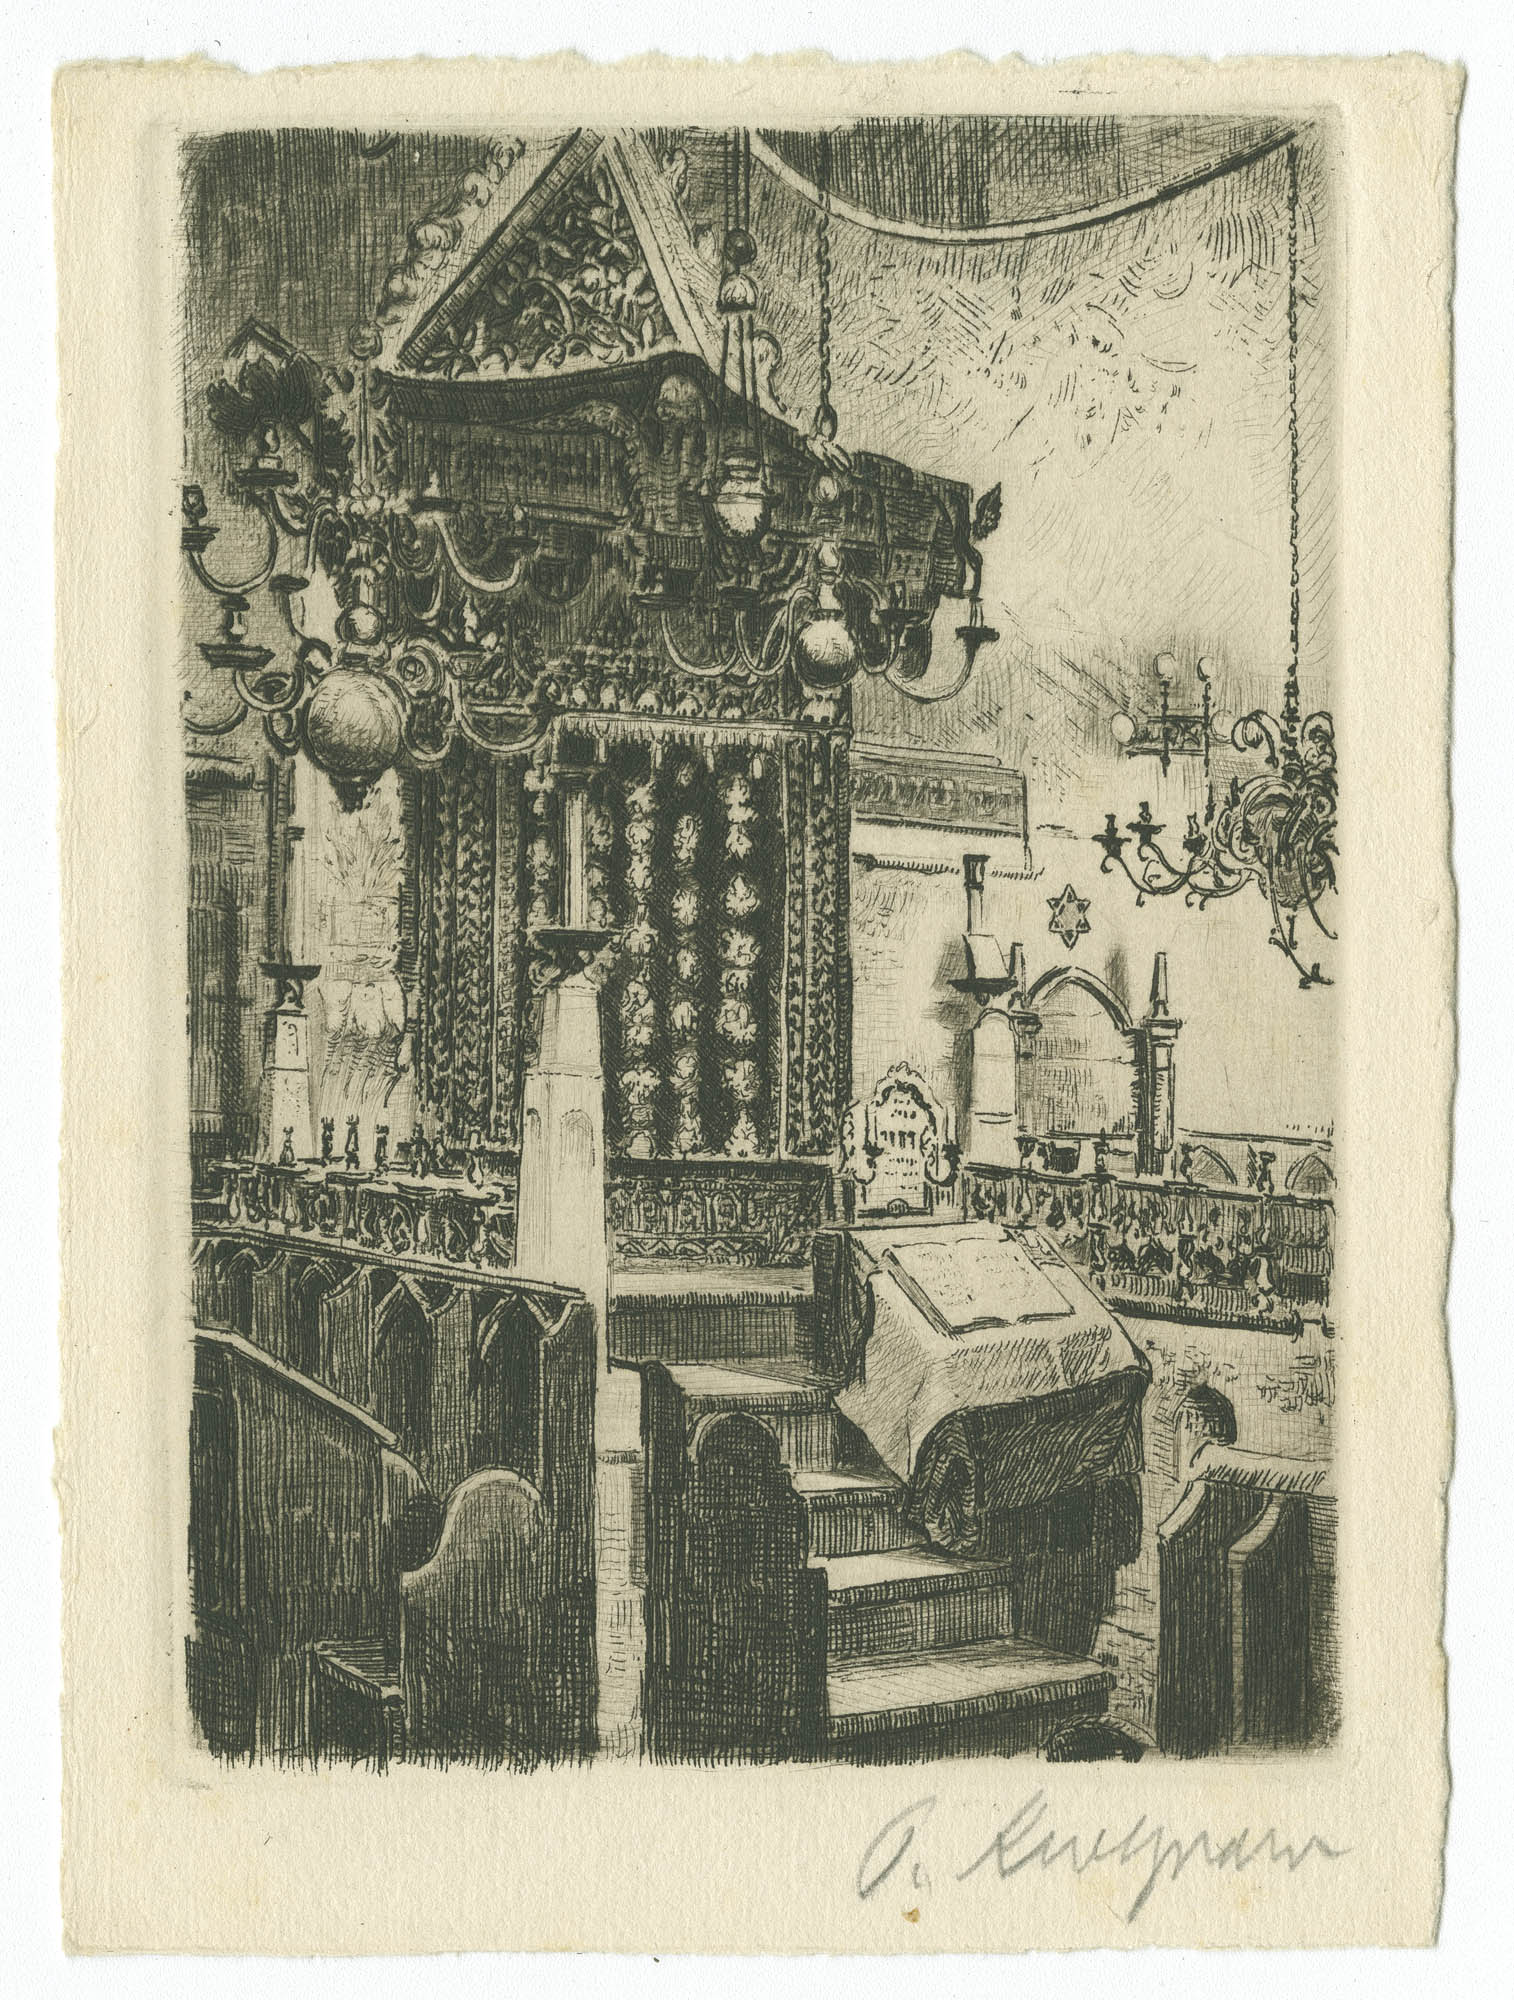 Praha, Staronová synagoga. Vnitřní pohled (Oltář) / Prag, Altneu-Synagoge. Innenansicht (Altar)